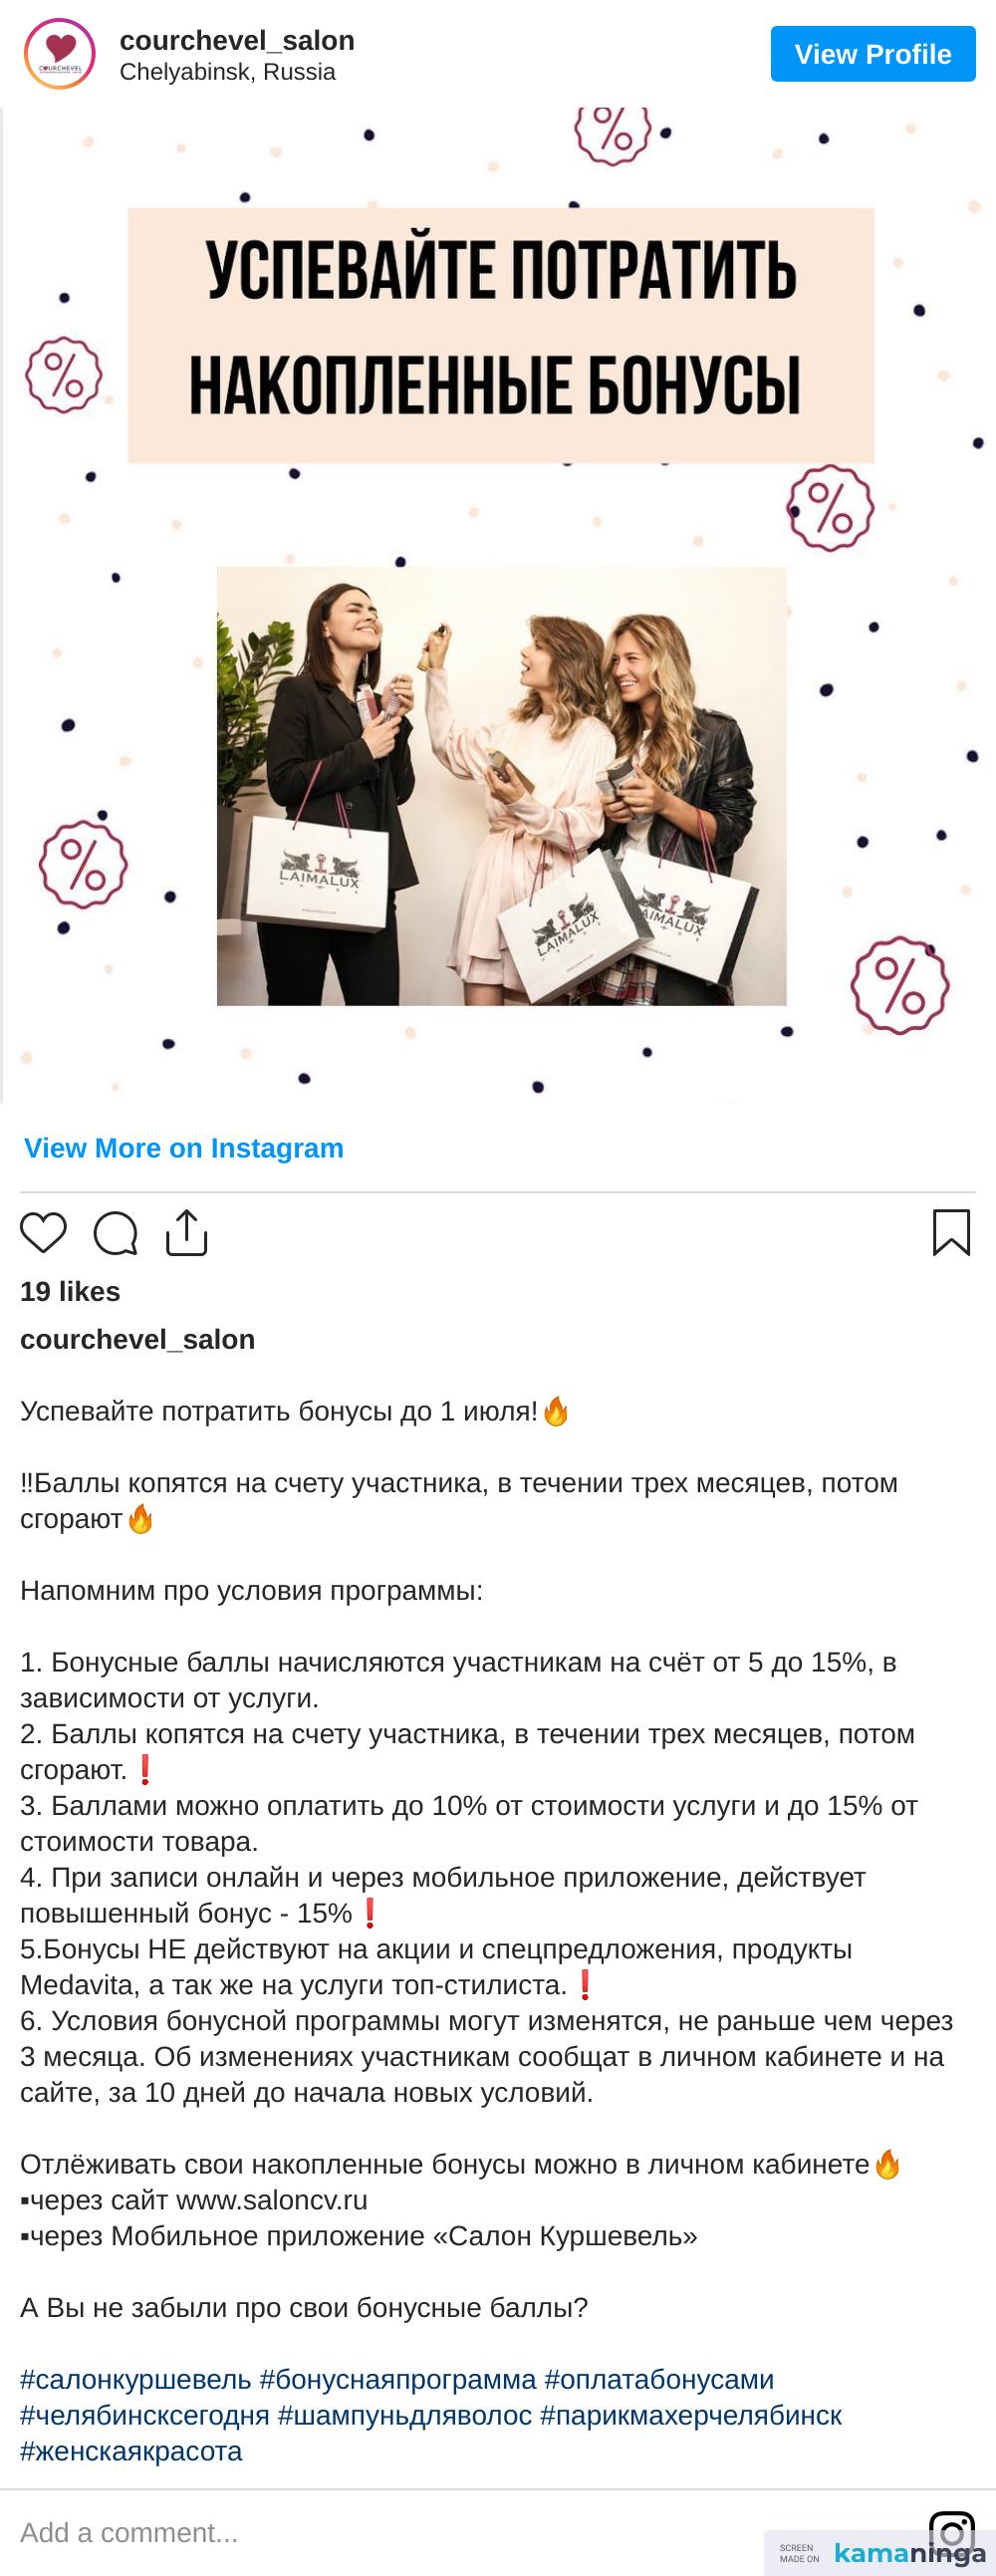 https://www.instagram.com/p/CP2hQY5gOMG/